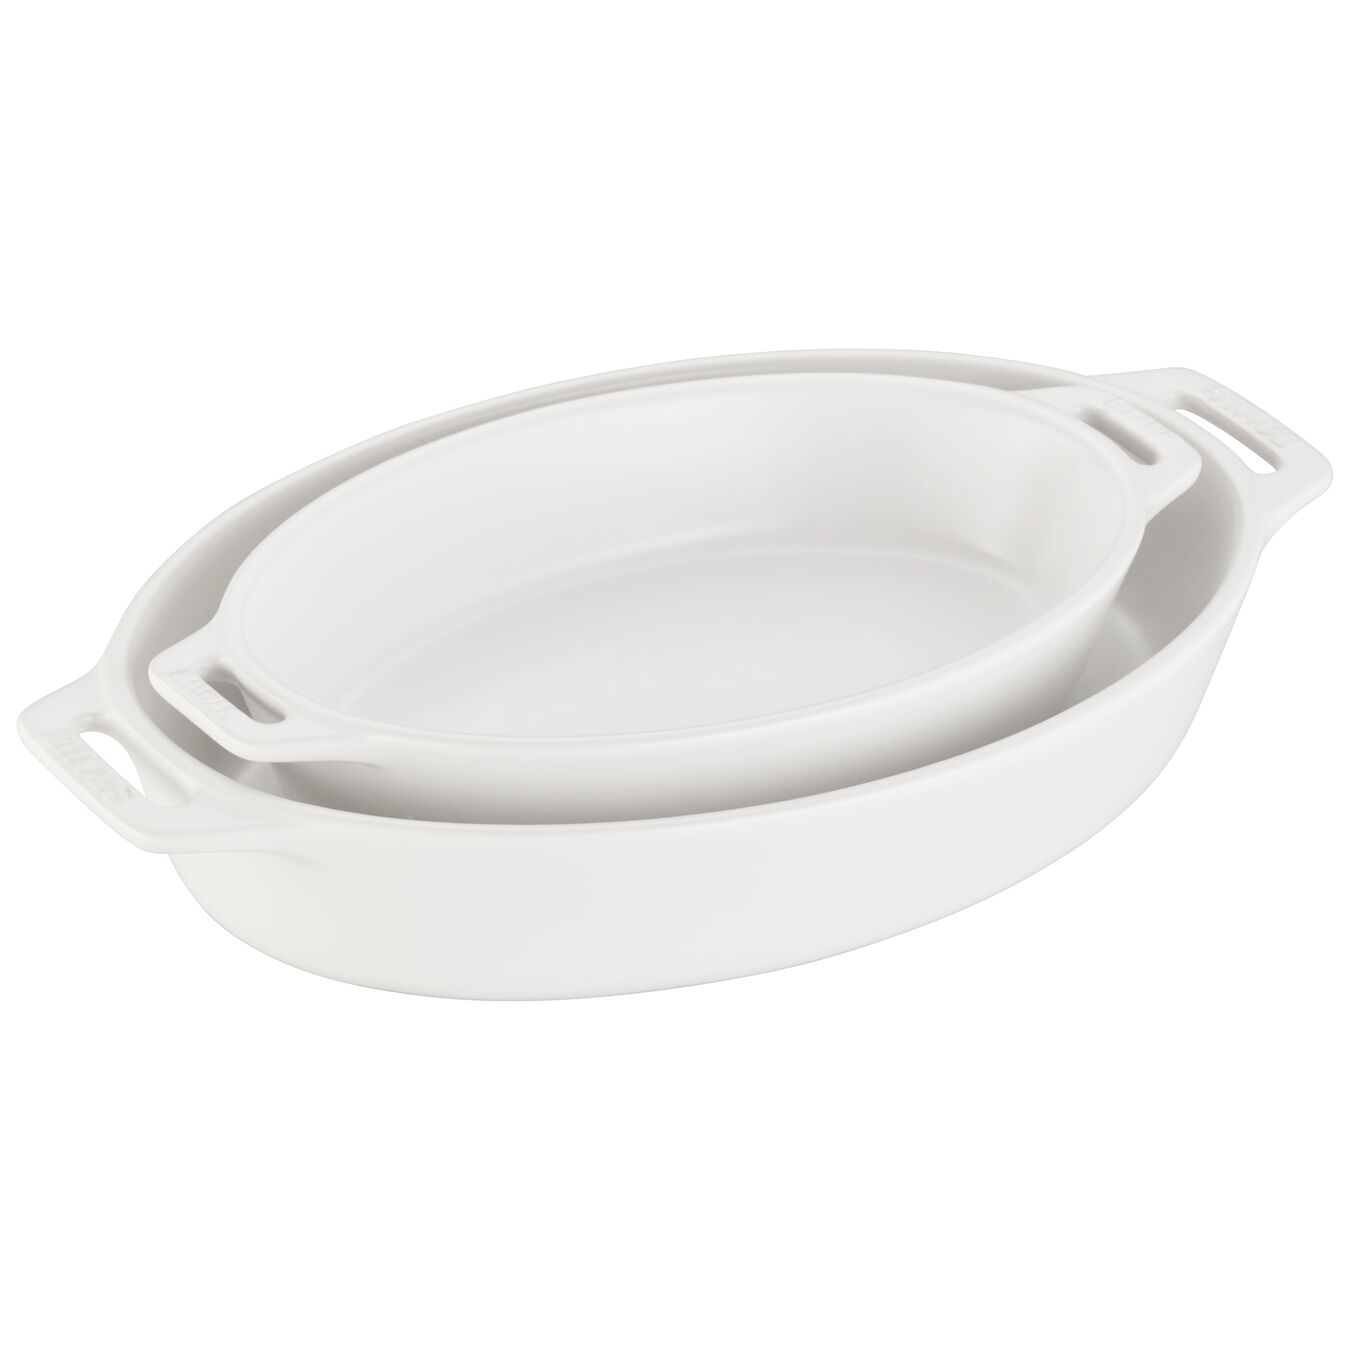 2-pc, oval, Bakeware set, matte white,,large 1